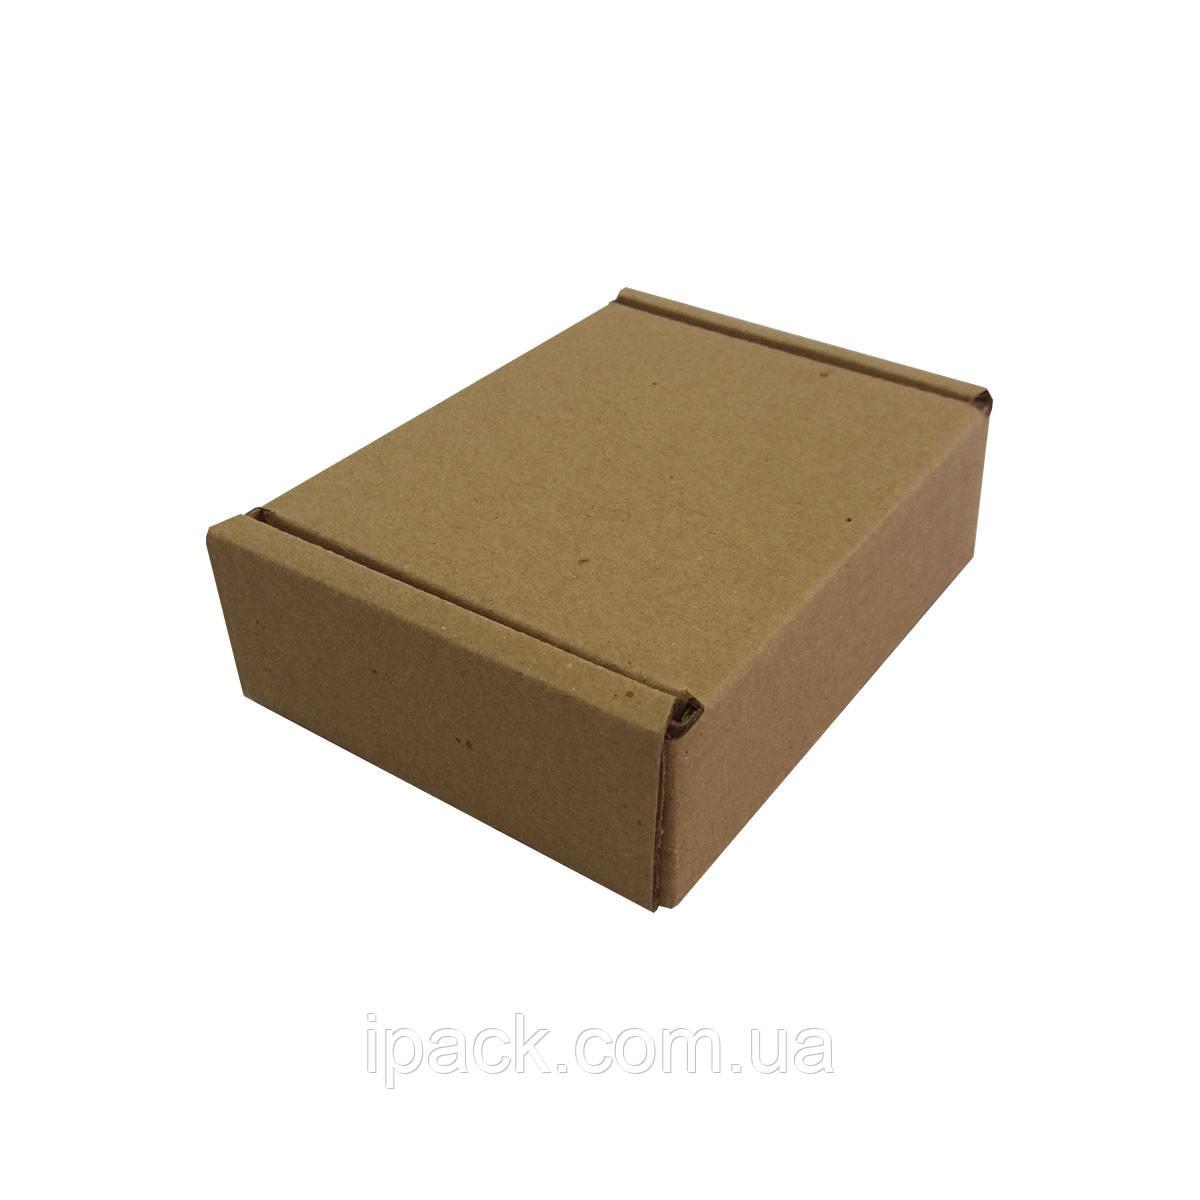 Коробка картонная самосборная, 85*70*30, мм, бурая, крафт, микрогофрокартон